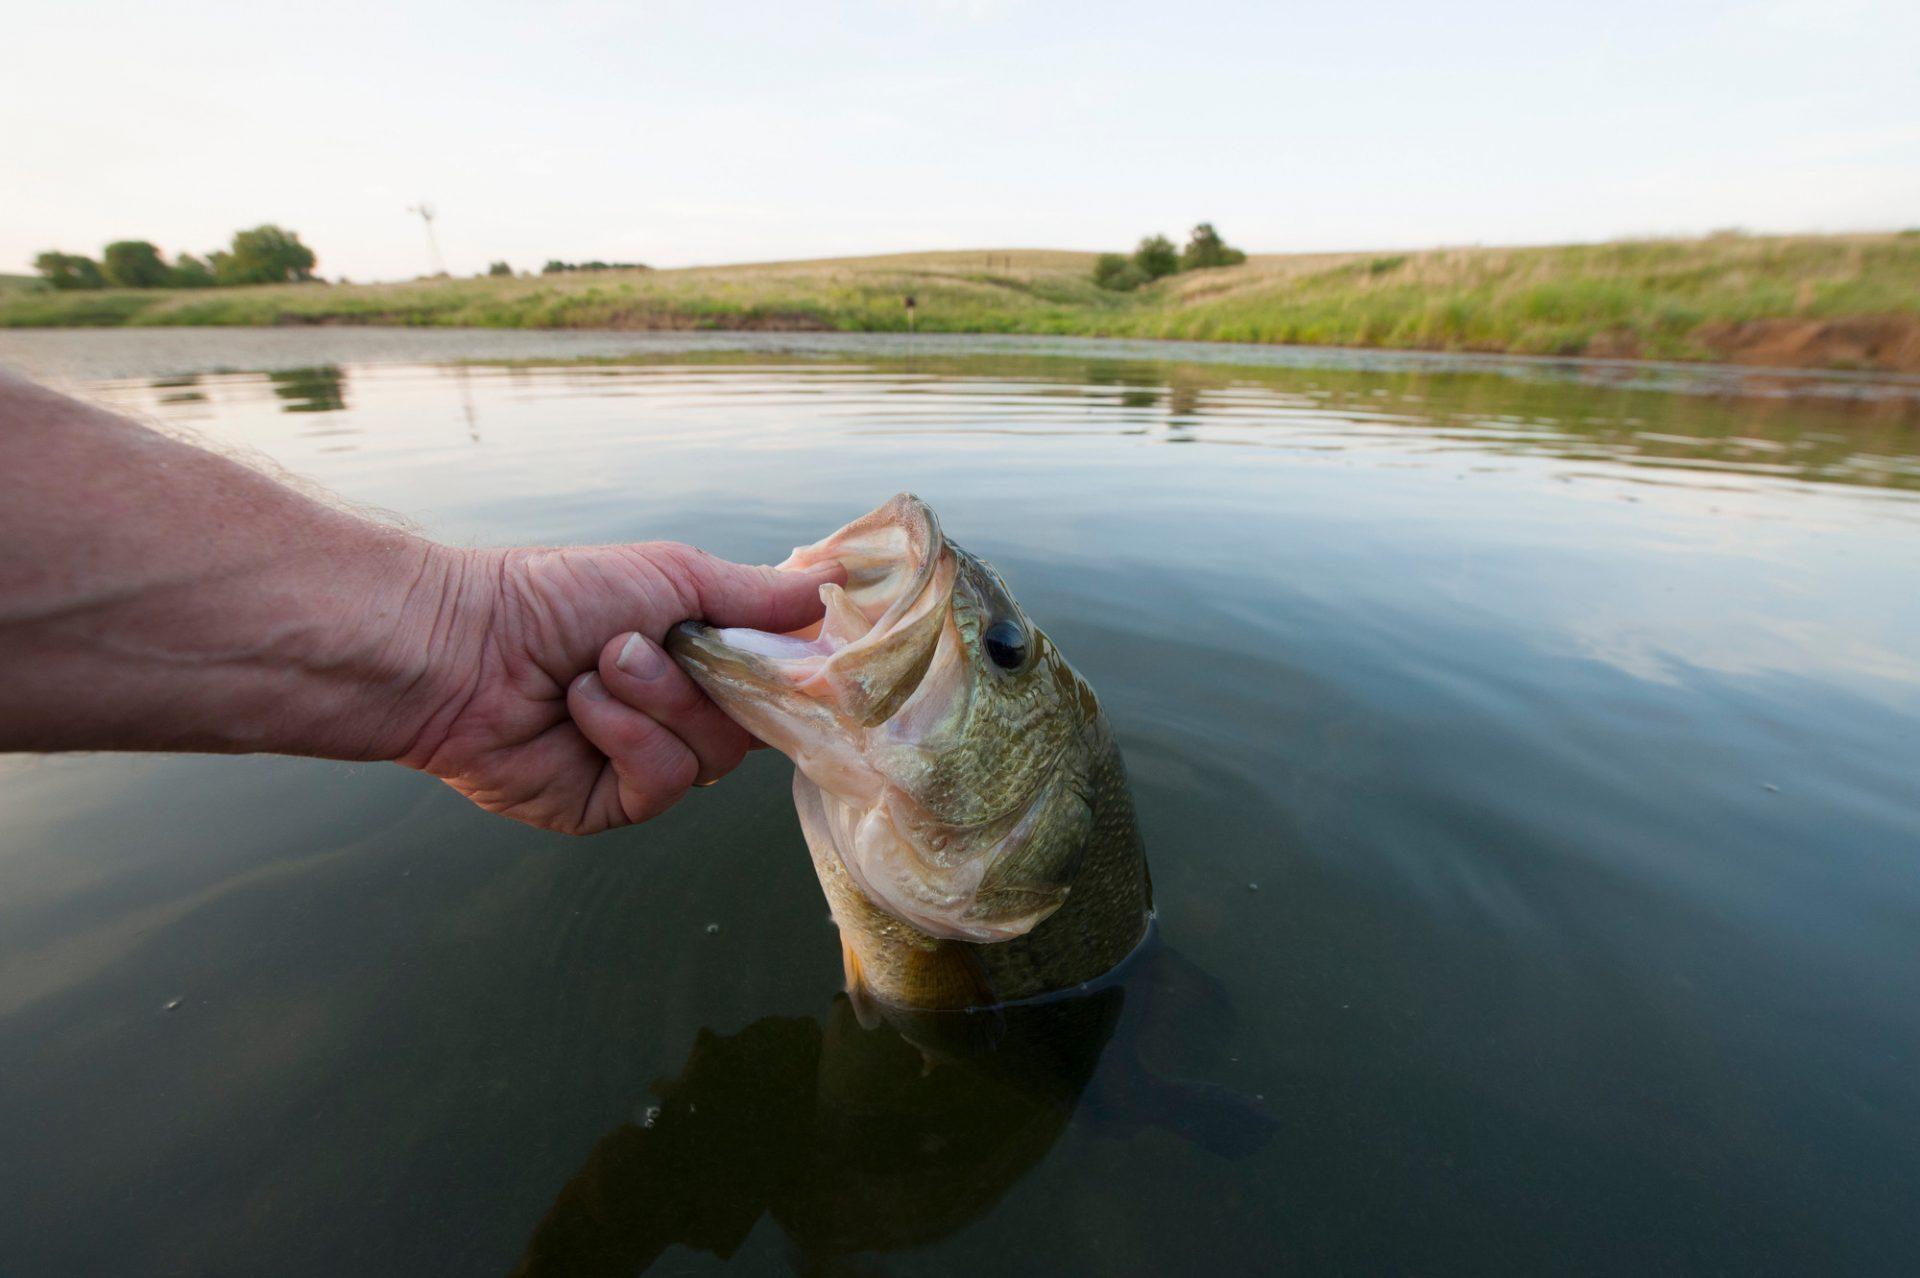 Photo: A man releases a large mouth bass into a farm pond near, Valparaiso, Nebraska.